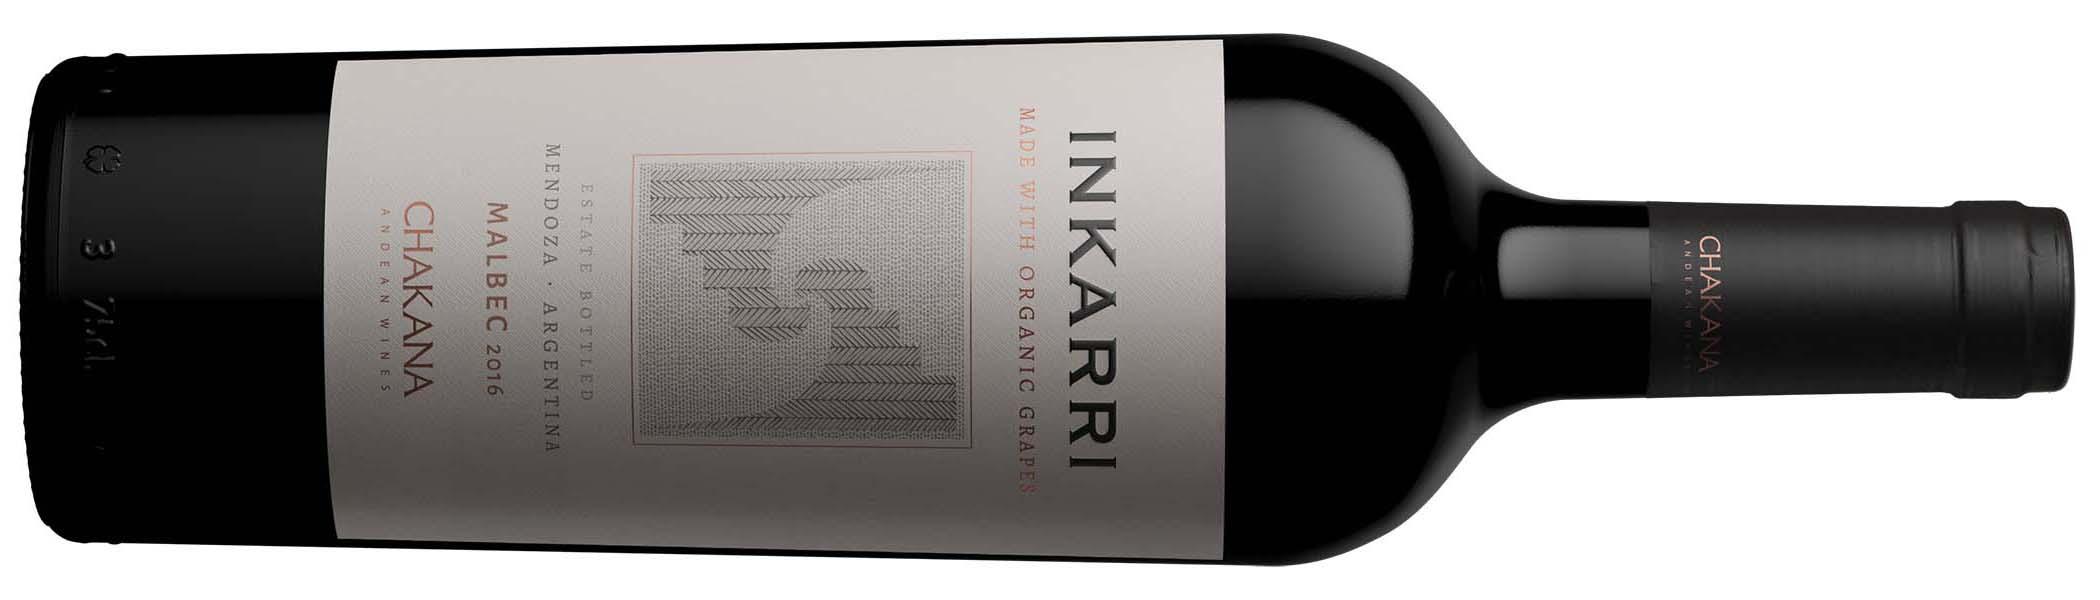 Best organic wines of 2018